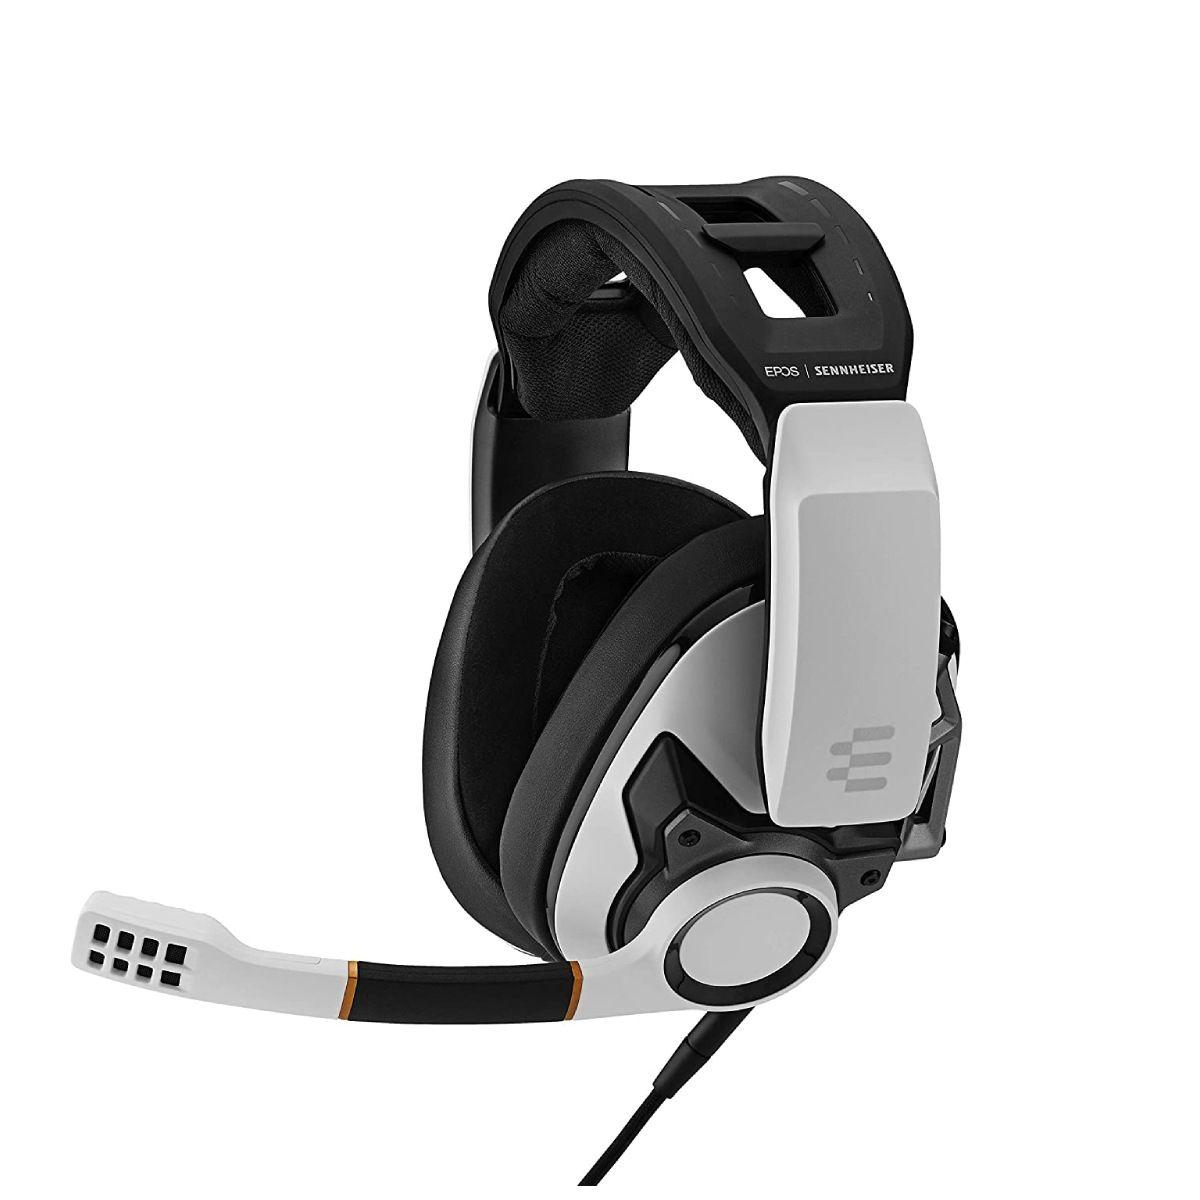 EPOS I सीनहीसर GSP 601 गेमिंग Headset